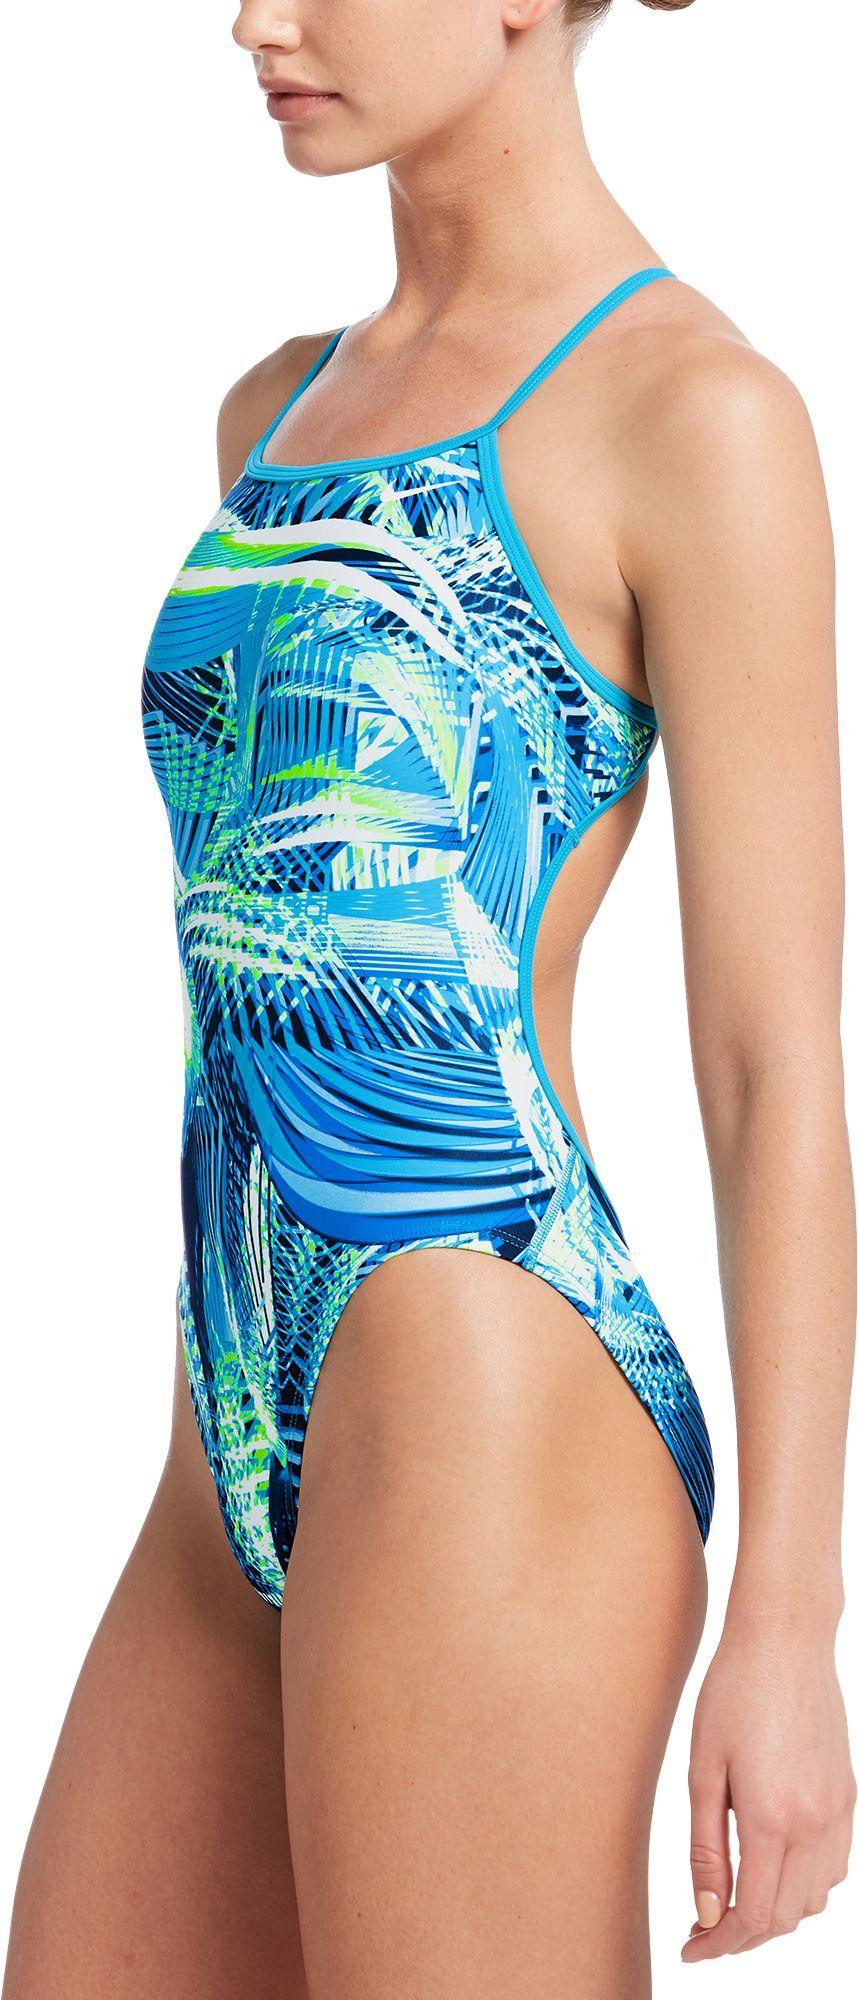 1377ba14c8 Nike - Blue Whirl Modern Cut-out One Piece Swimsuit - Lyst. View fullscreen